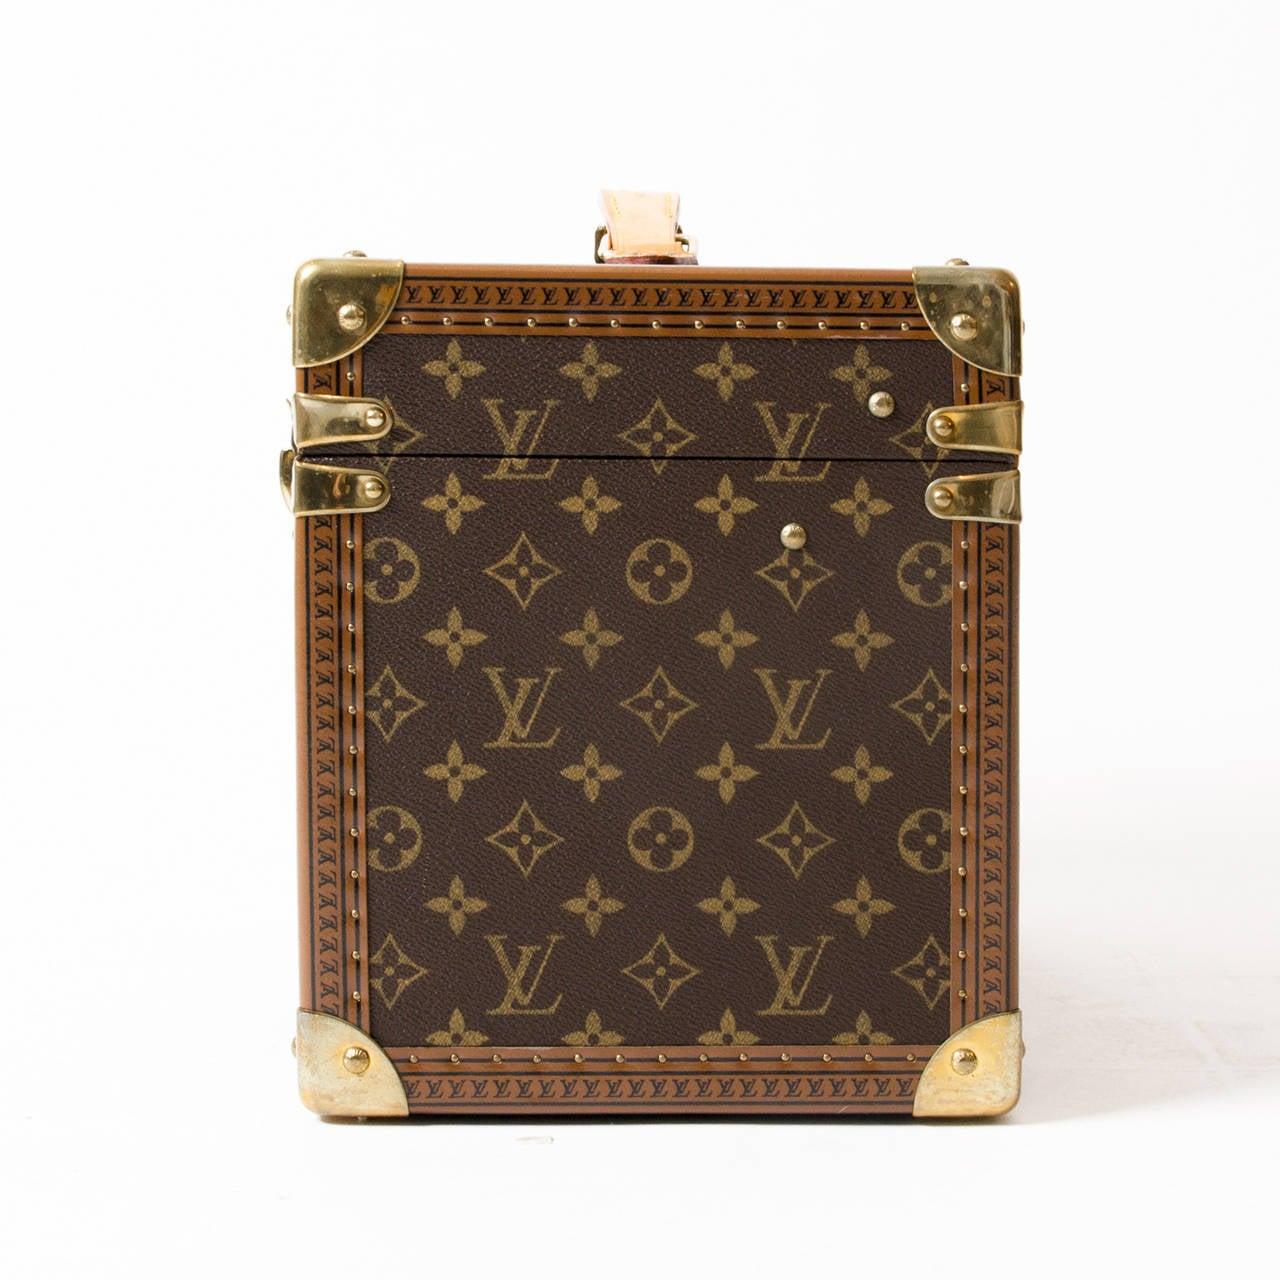 Louis Vuitton Toiletry Case Monogram 3